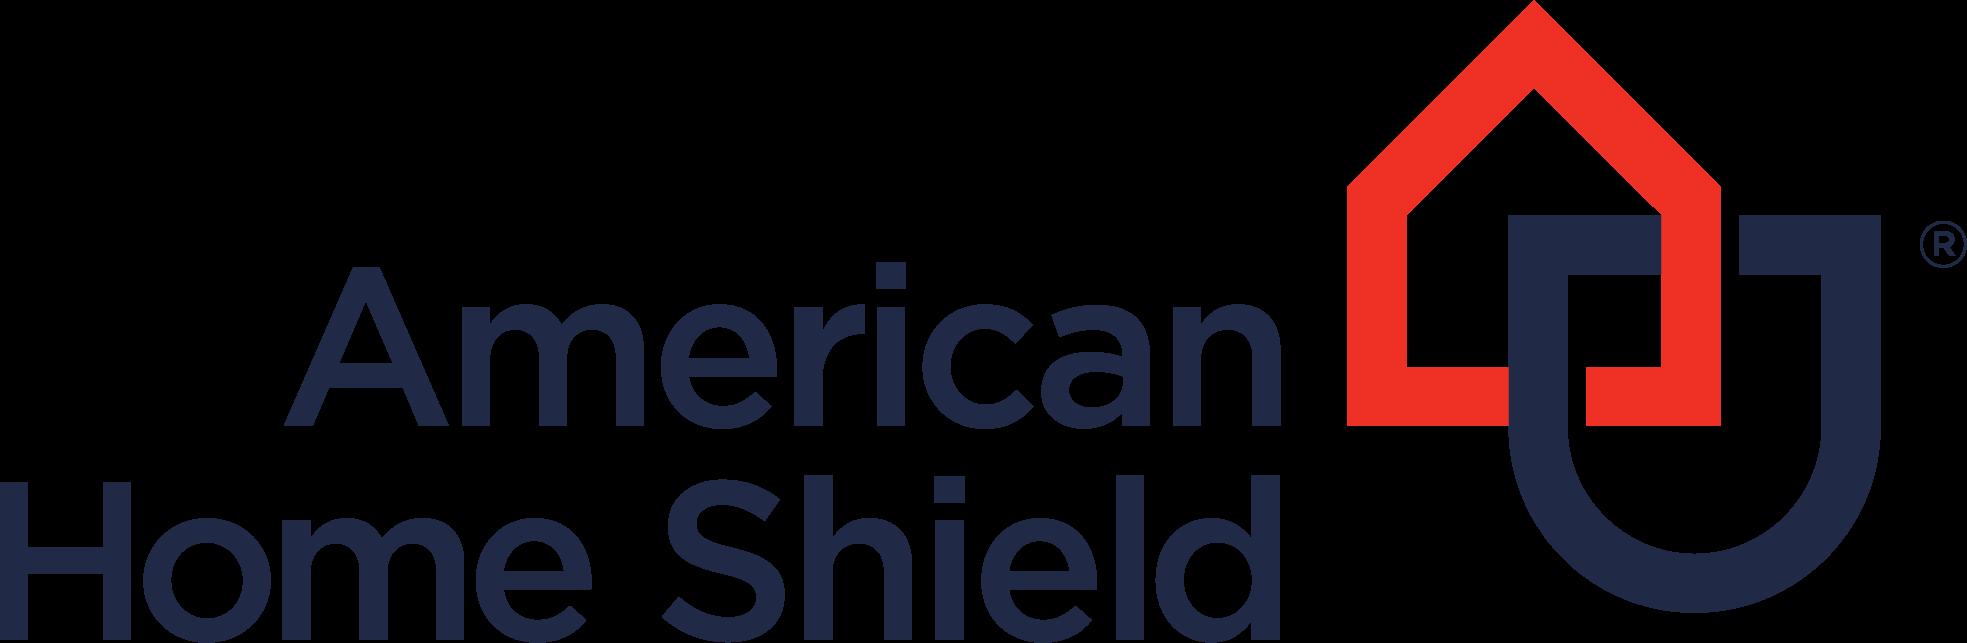 American Home Shield ®